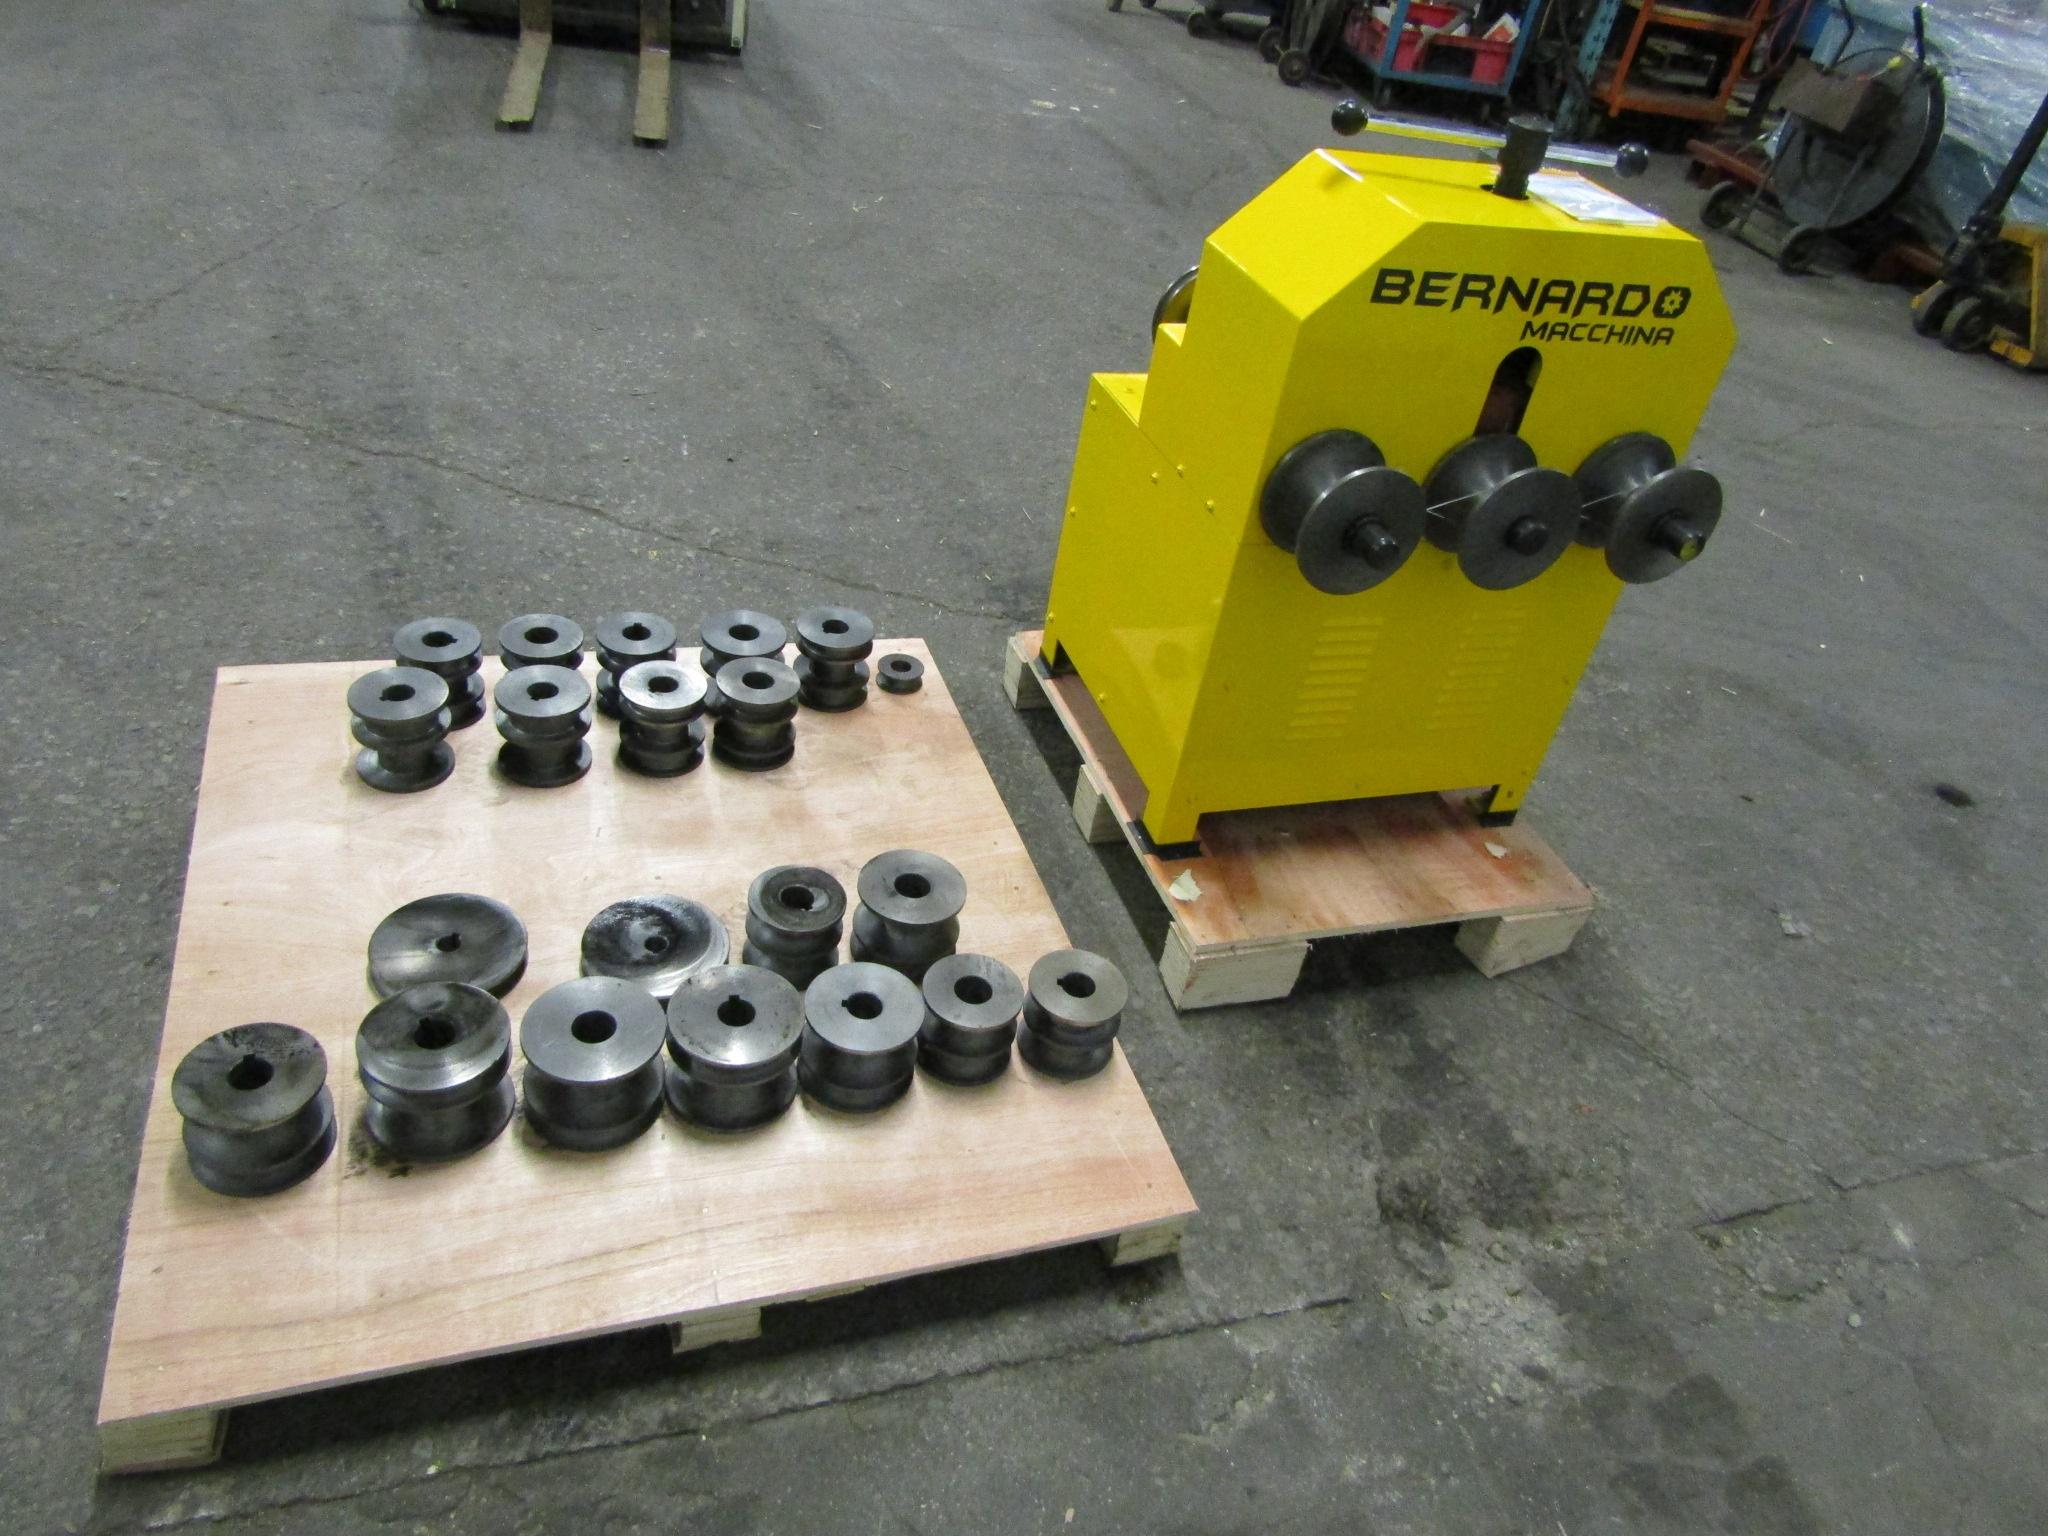 "Bernardo Pyramid Angle Rolls Conduit Bender - Tube Bender with 22 dies 0.5-3"" capacity MINT / UNUSED - Image 2 of 3"